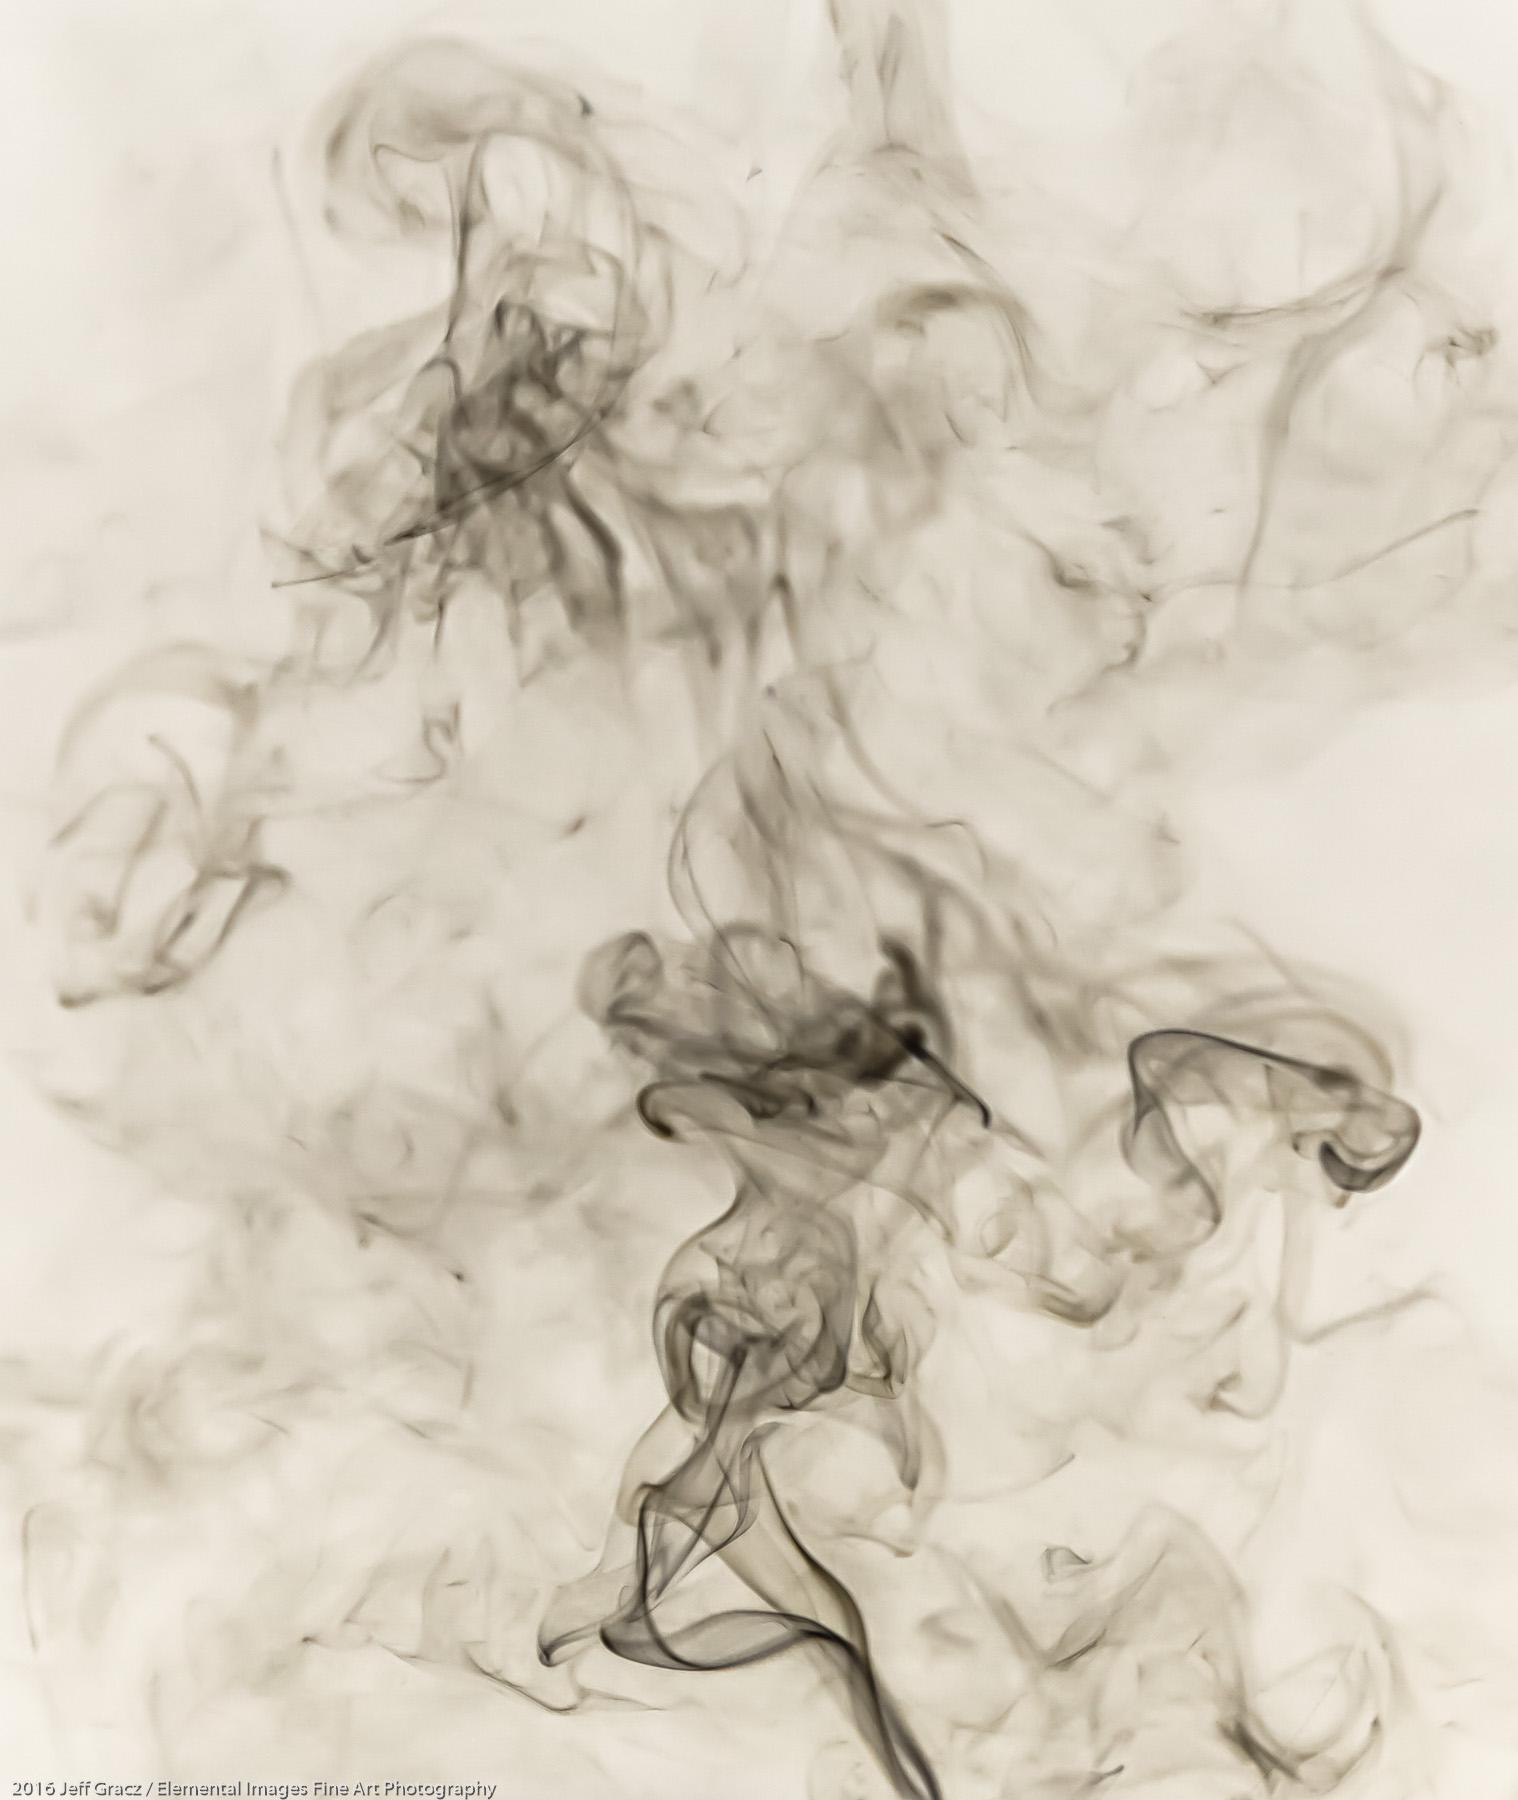 Smoke 30   Vancouver   WA   USA - © 2016 Jeff Gracz / Elemental Images Fine Art Photography - All Rights Reserved Worldwide